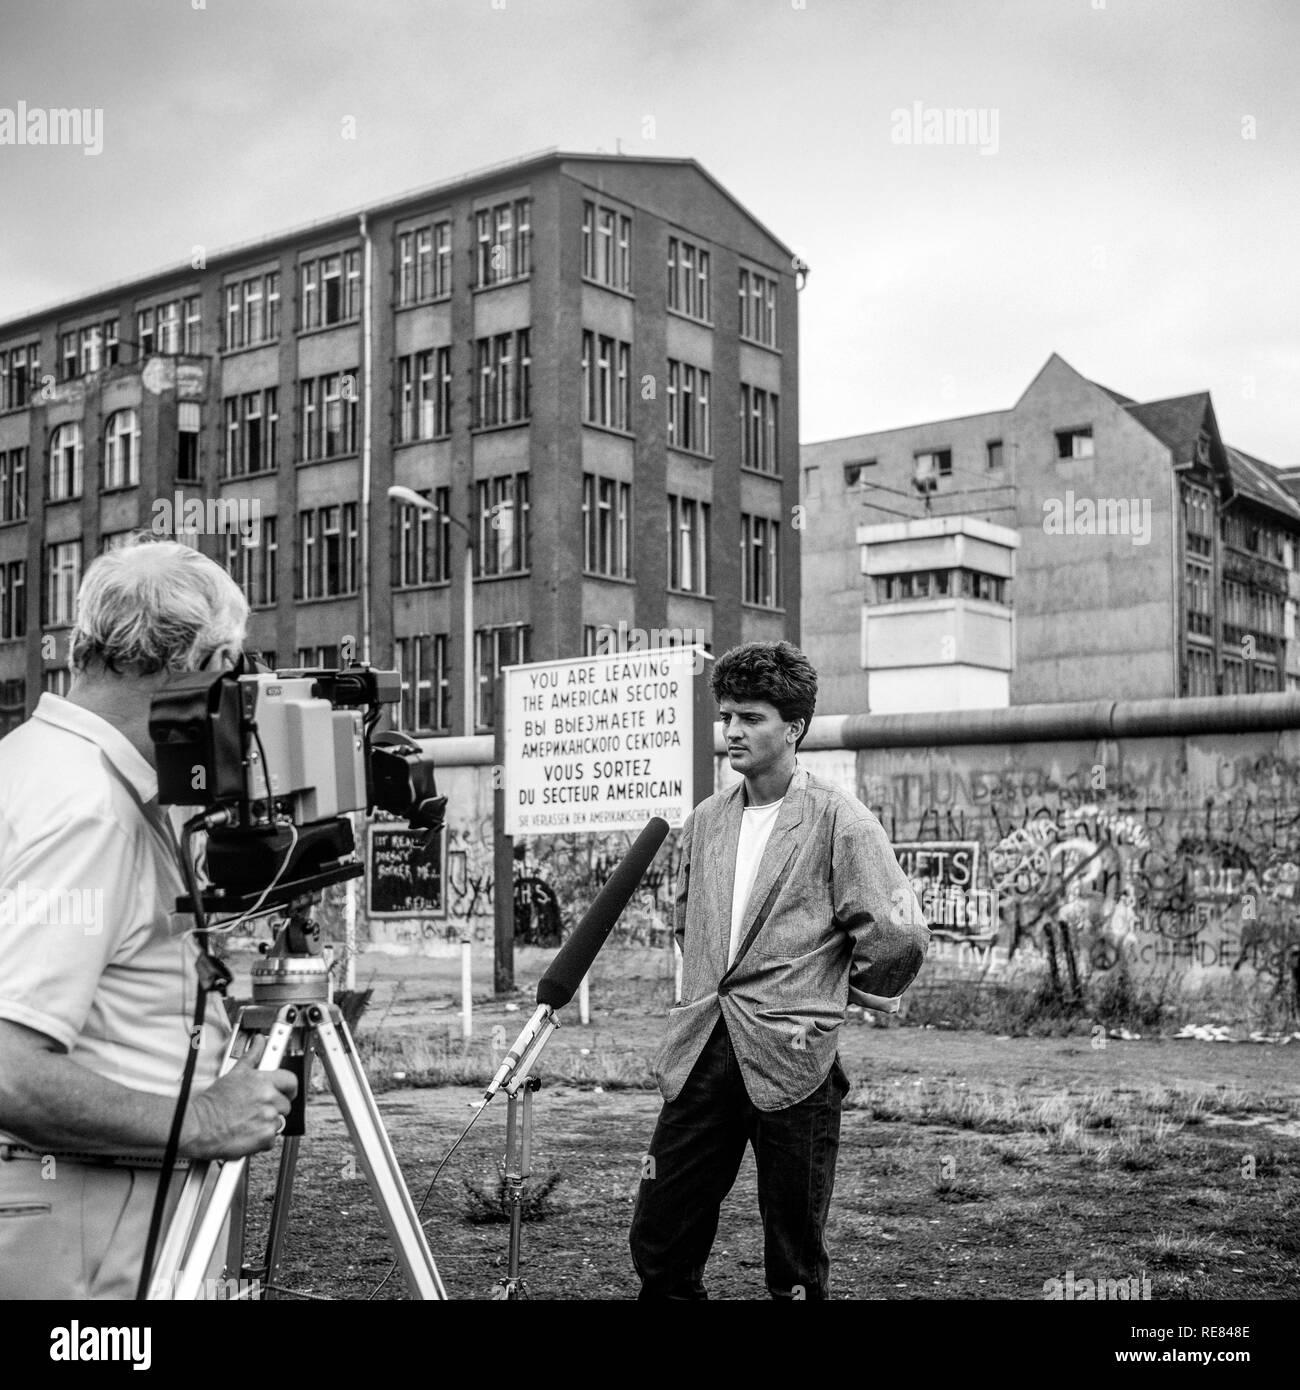 August 1986, TV interview of a former East soldier, Berlin Wall graffitis, East Berlin watchtower, Zimmerstrasse street, West Berlin, Germany, Europe, - Stock Image